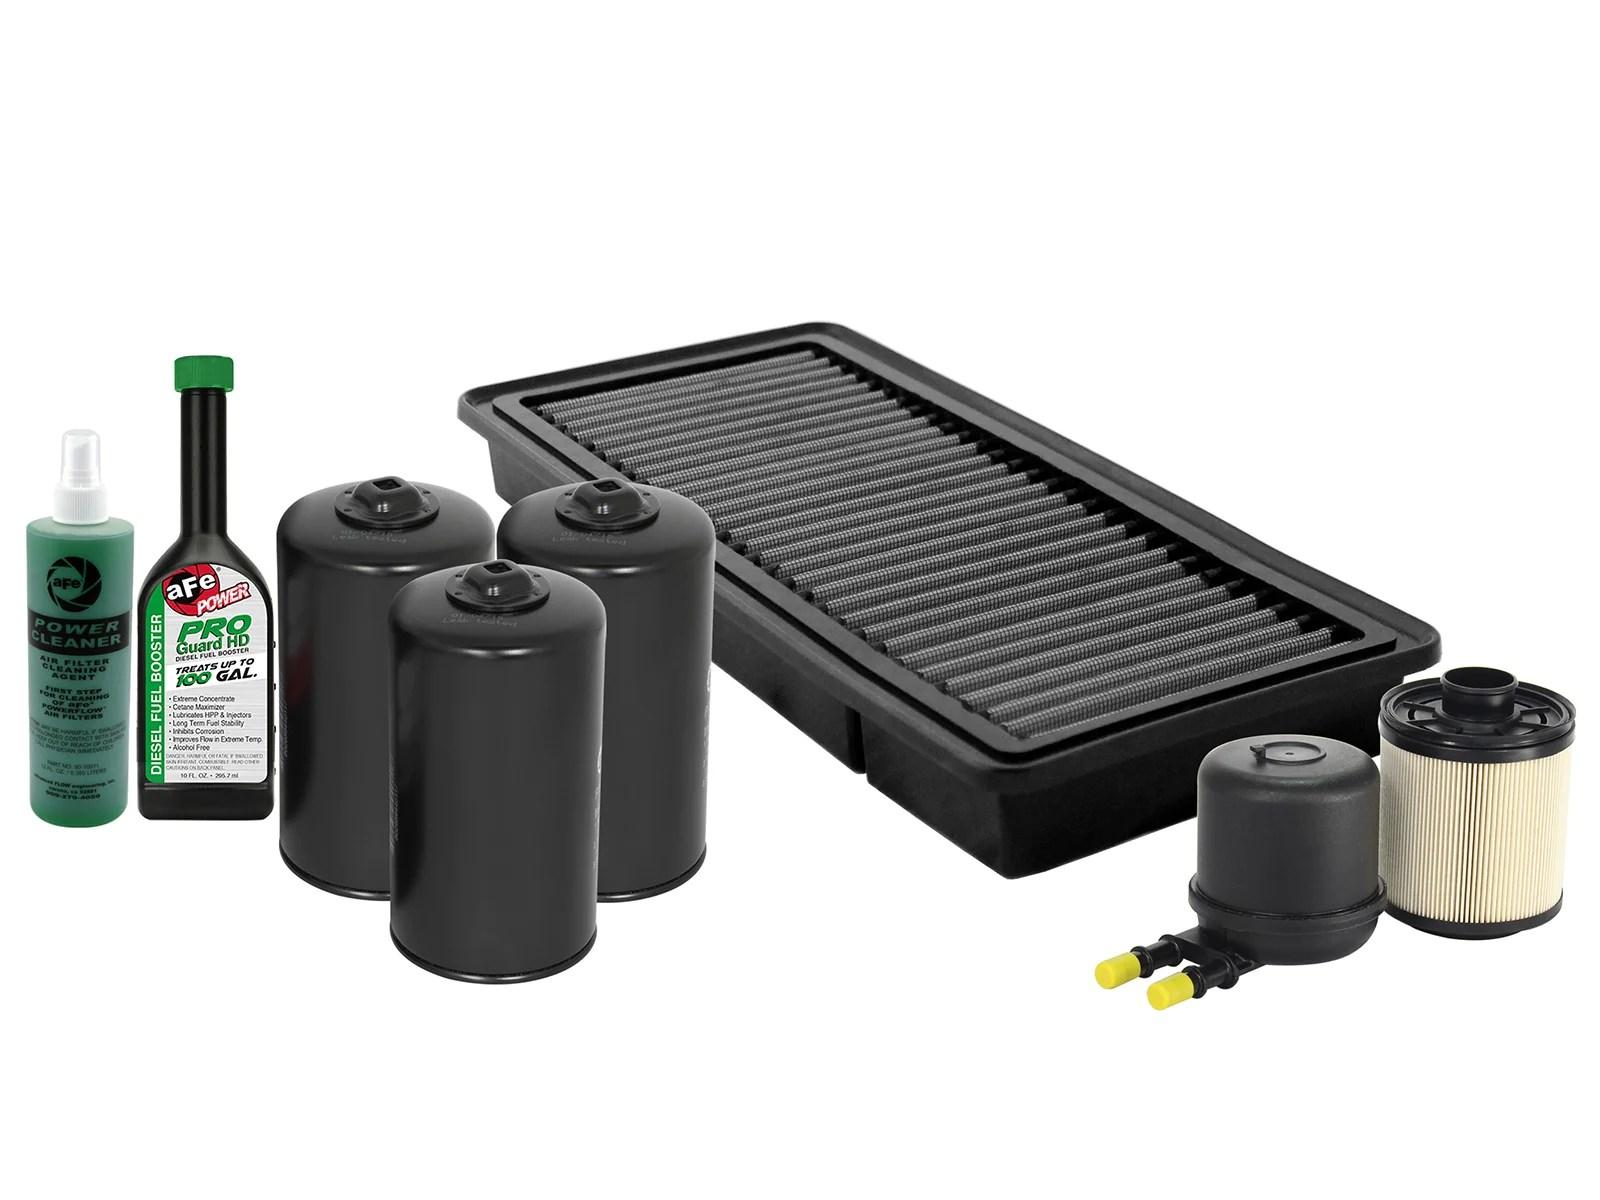 afe power filter service package northwest diesel [ 1600 x 1200 Pixel ]